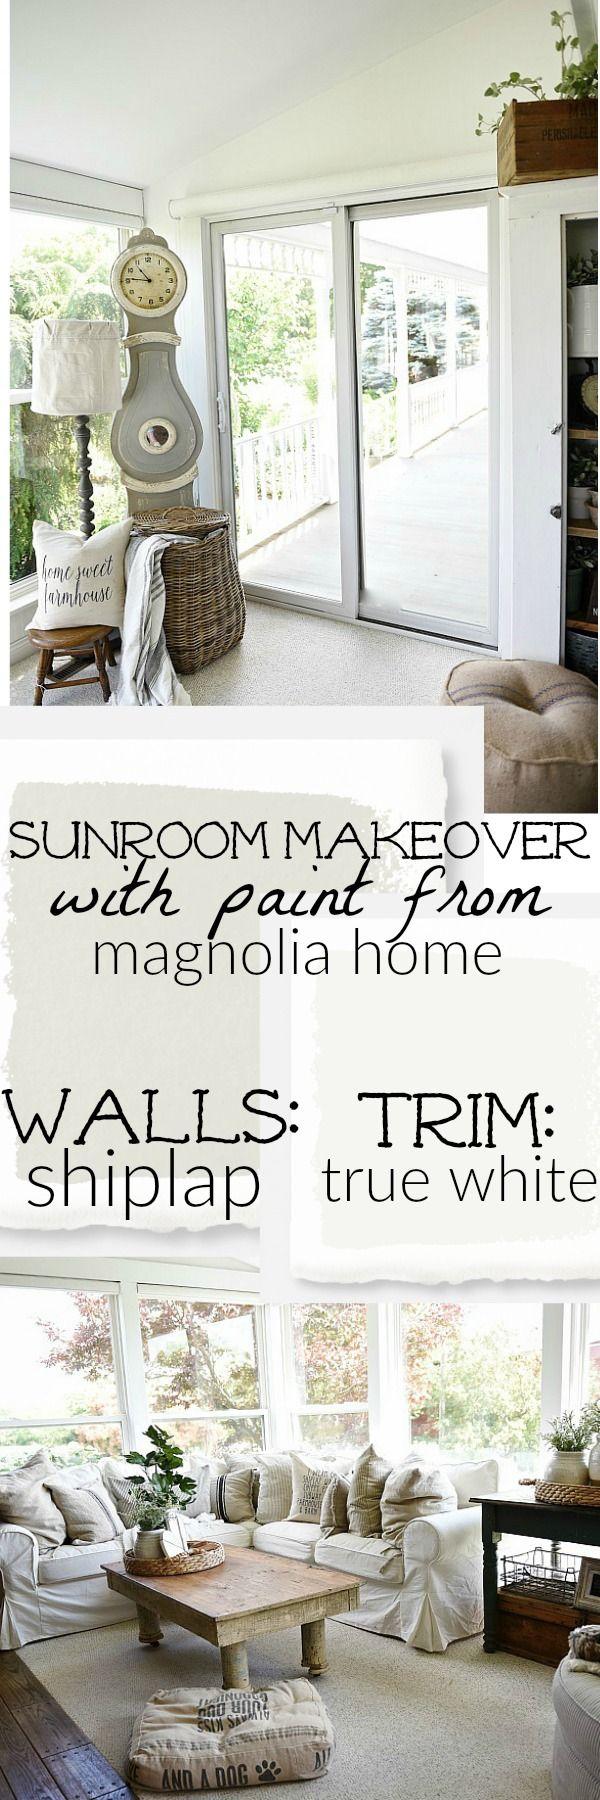 122 best magnolia home images on pinterest magnolia homes hue